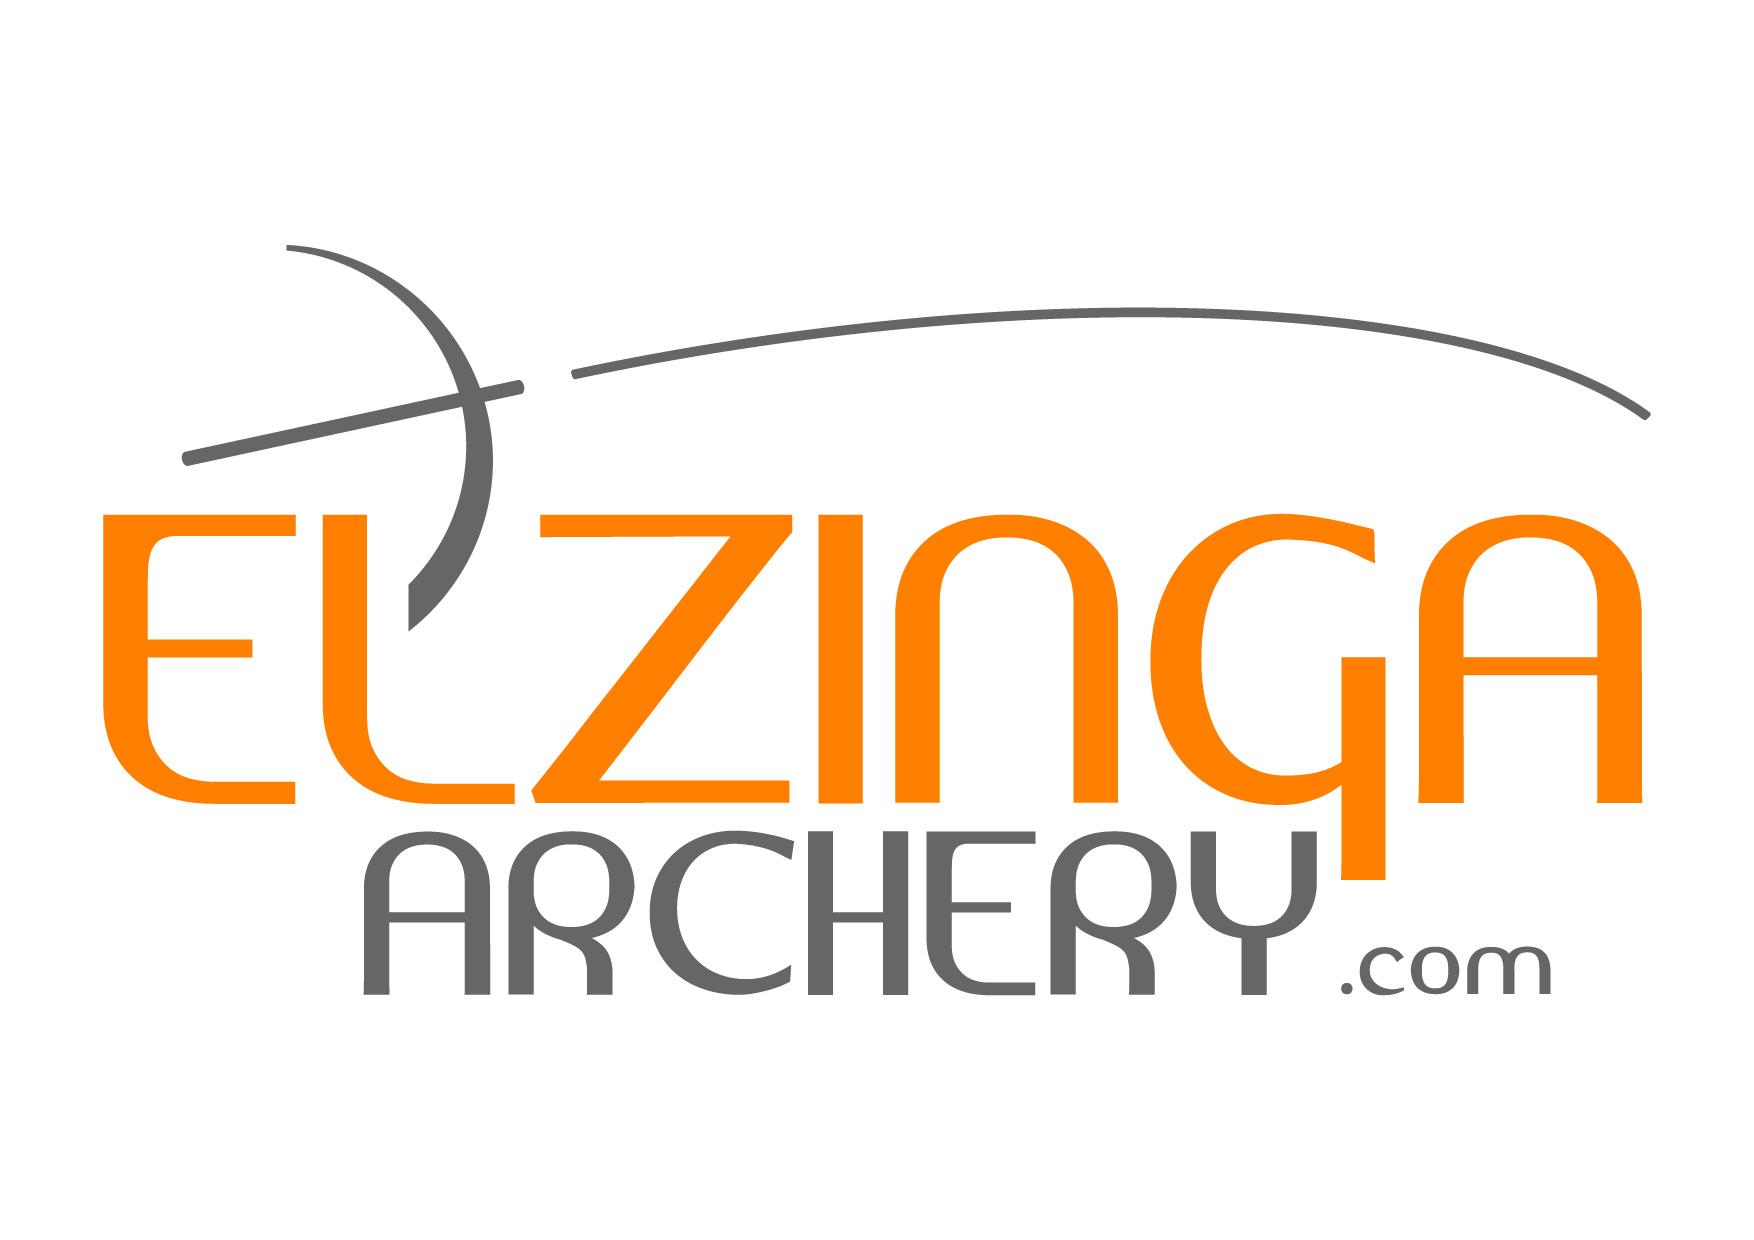 Elzinga archery